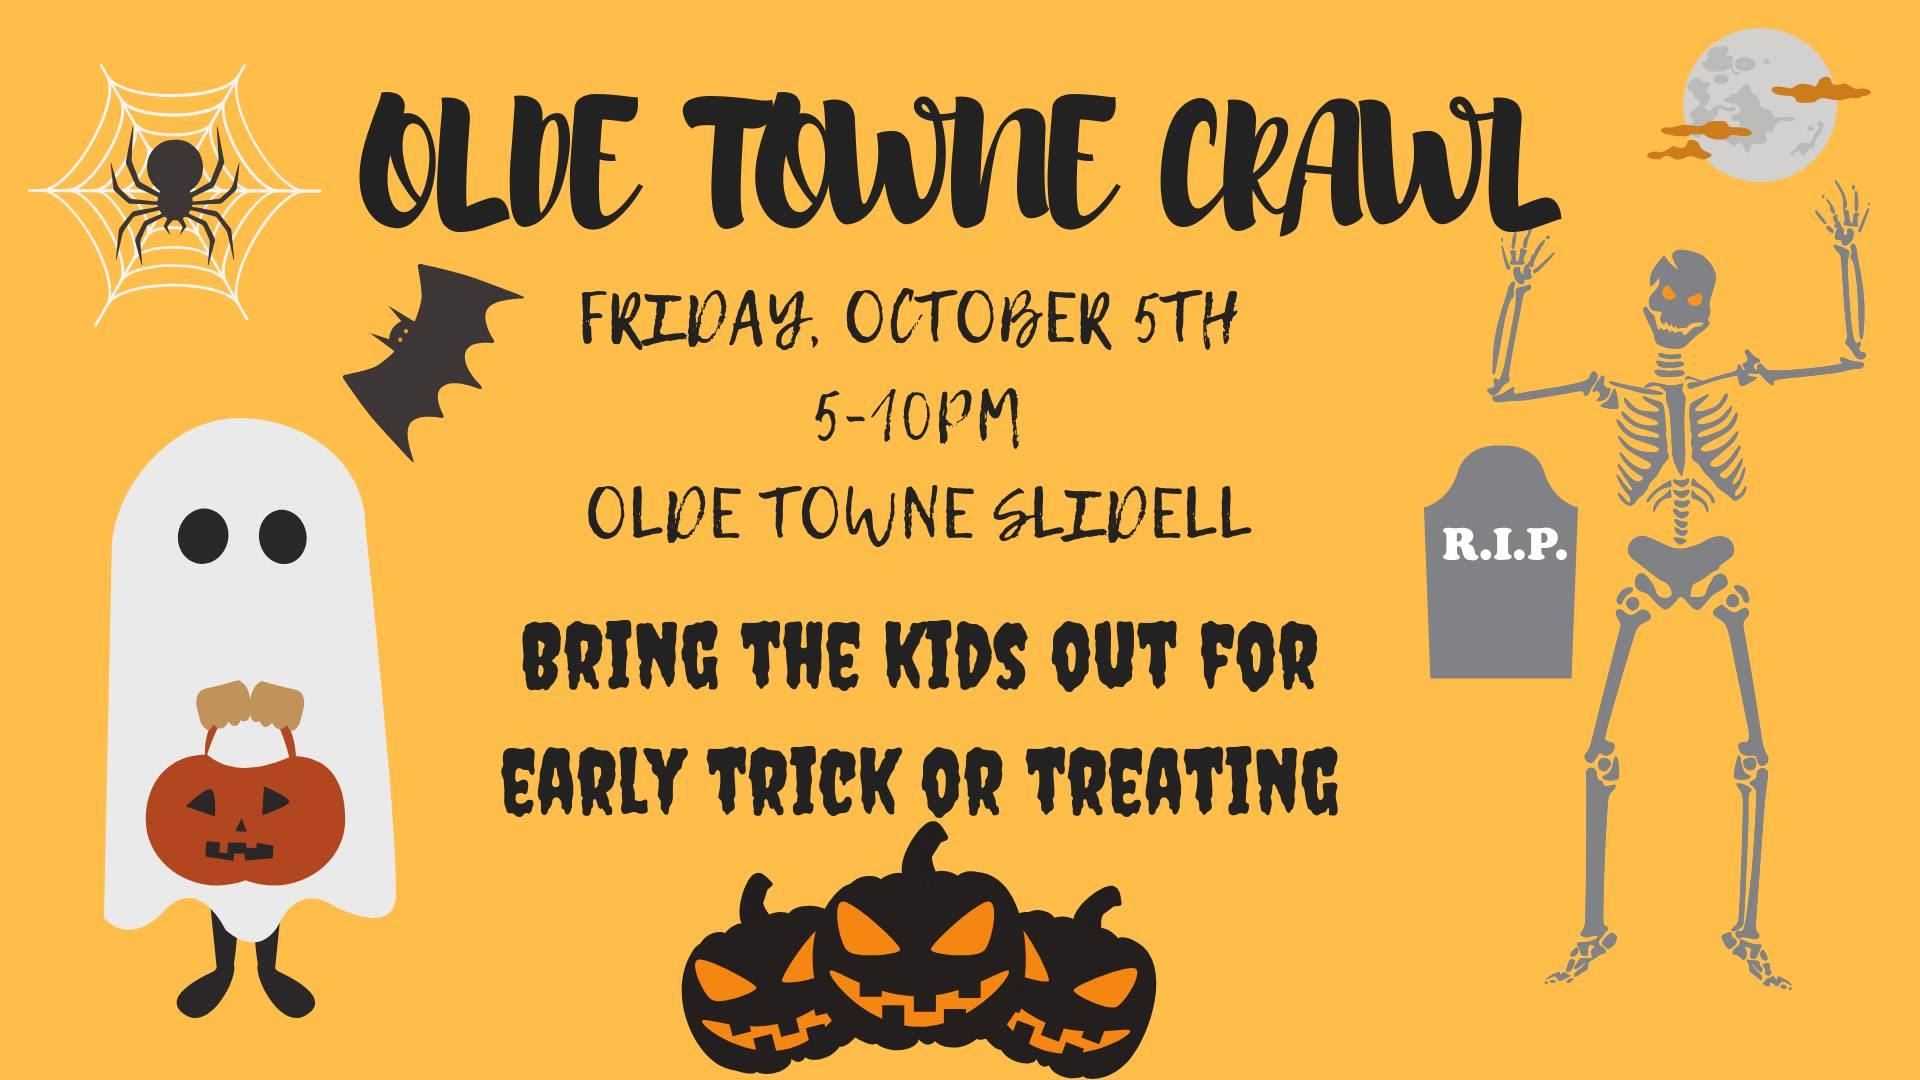 Olde Towne Crawl